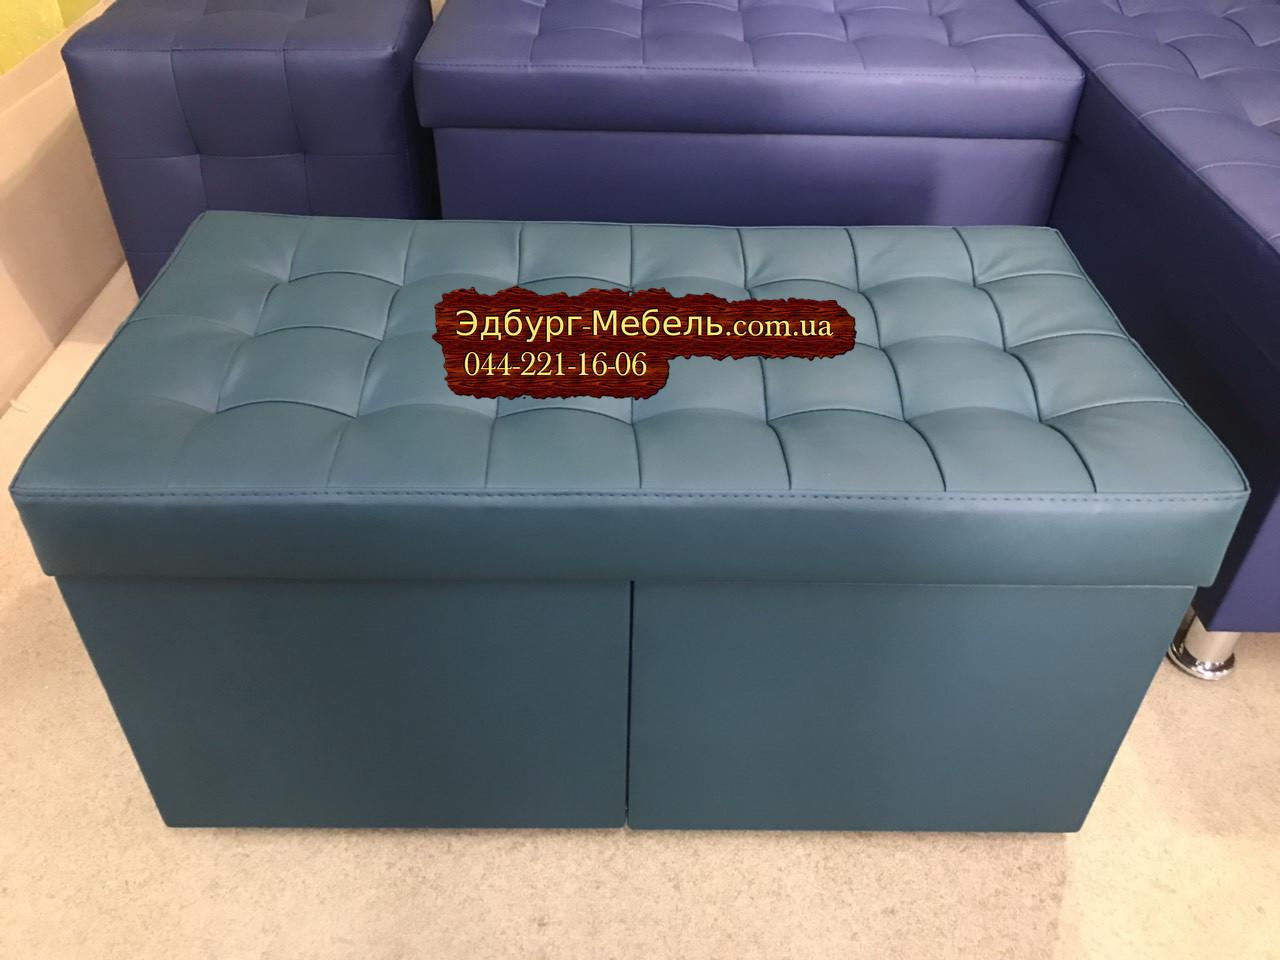 "Пуф-шкаф ""Королевский"" 800х400х450мм съёмные полки"